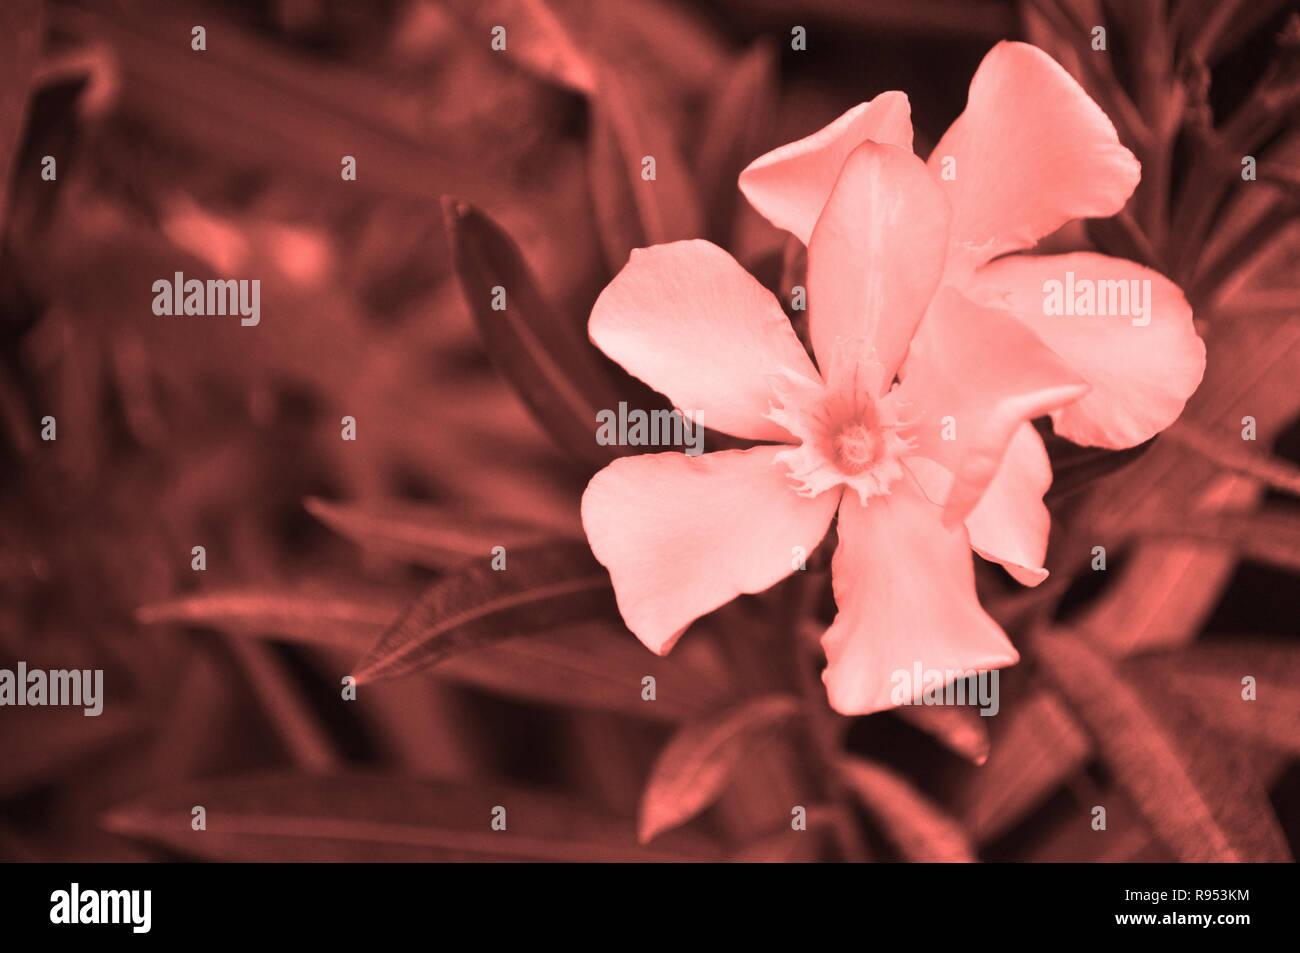 beautiful coral color oleander flowers on a bush color of 2019 concept R953KM